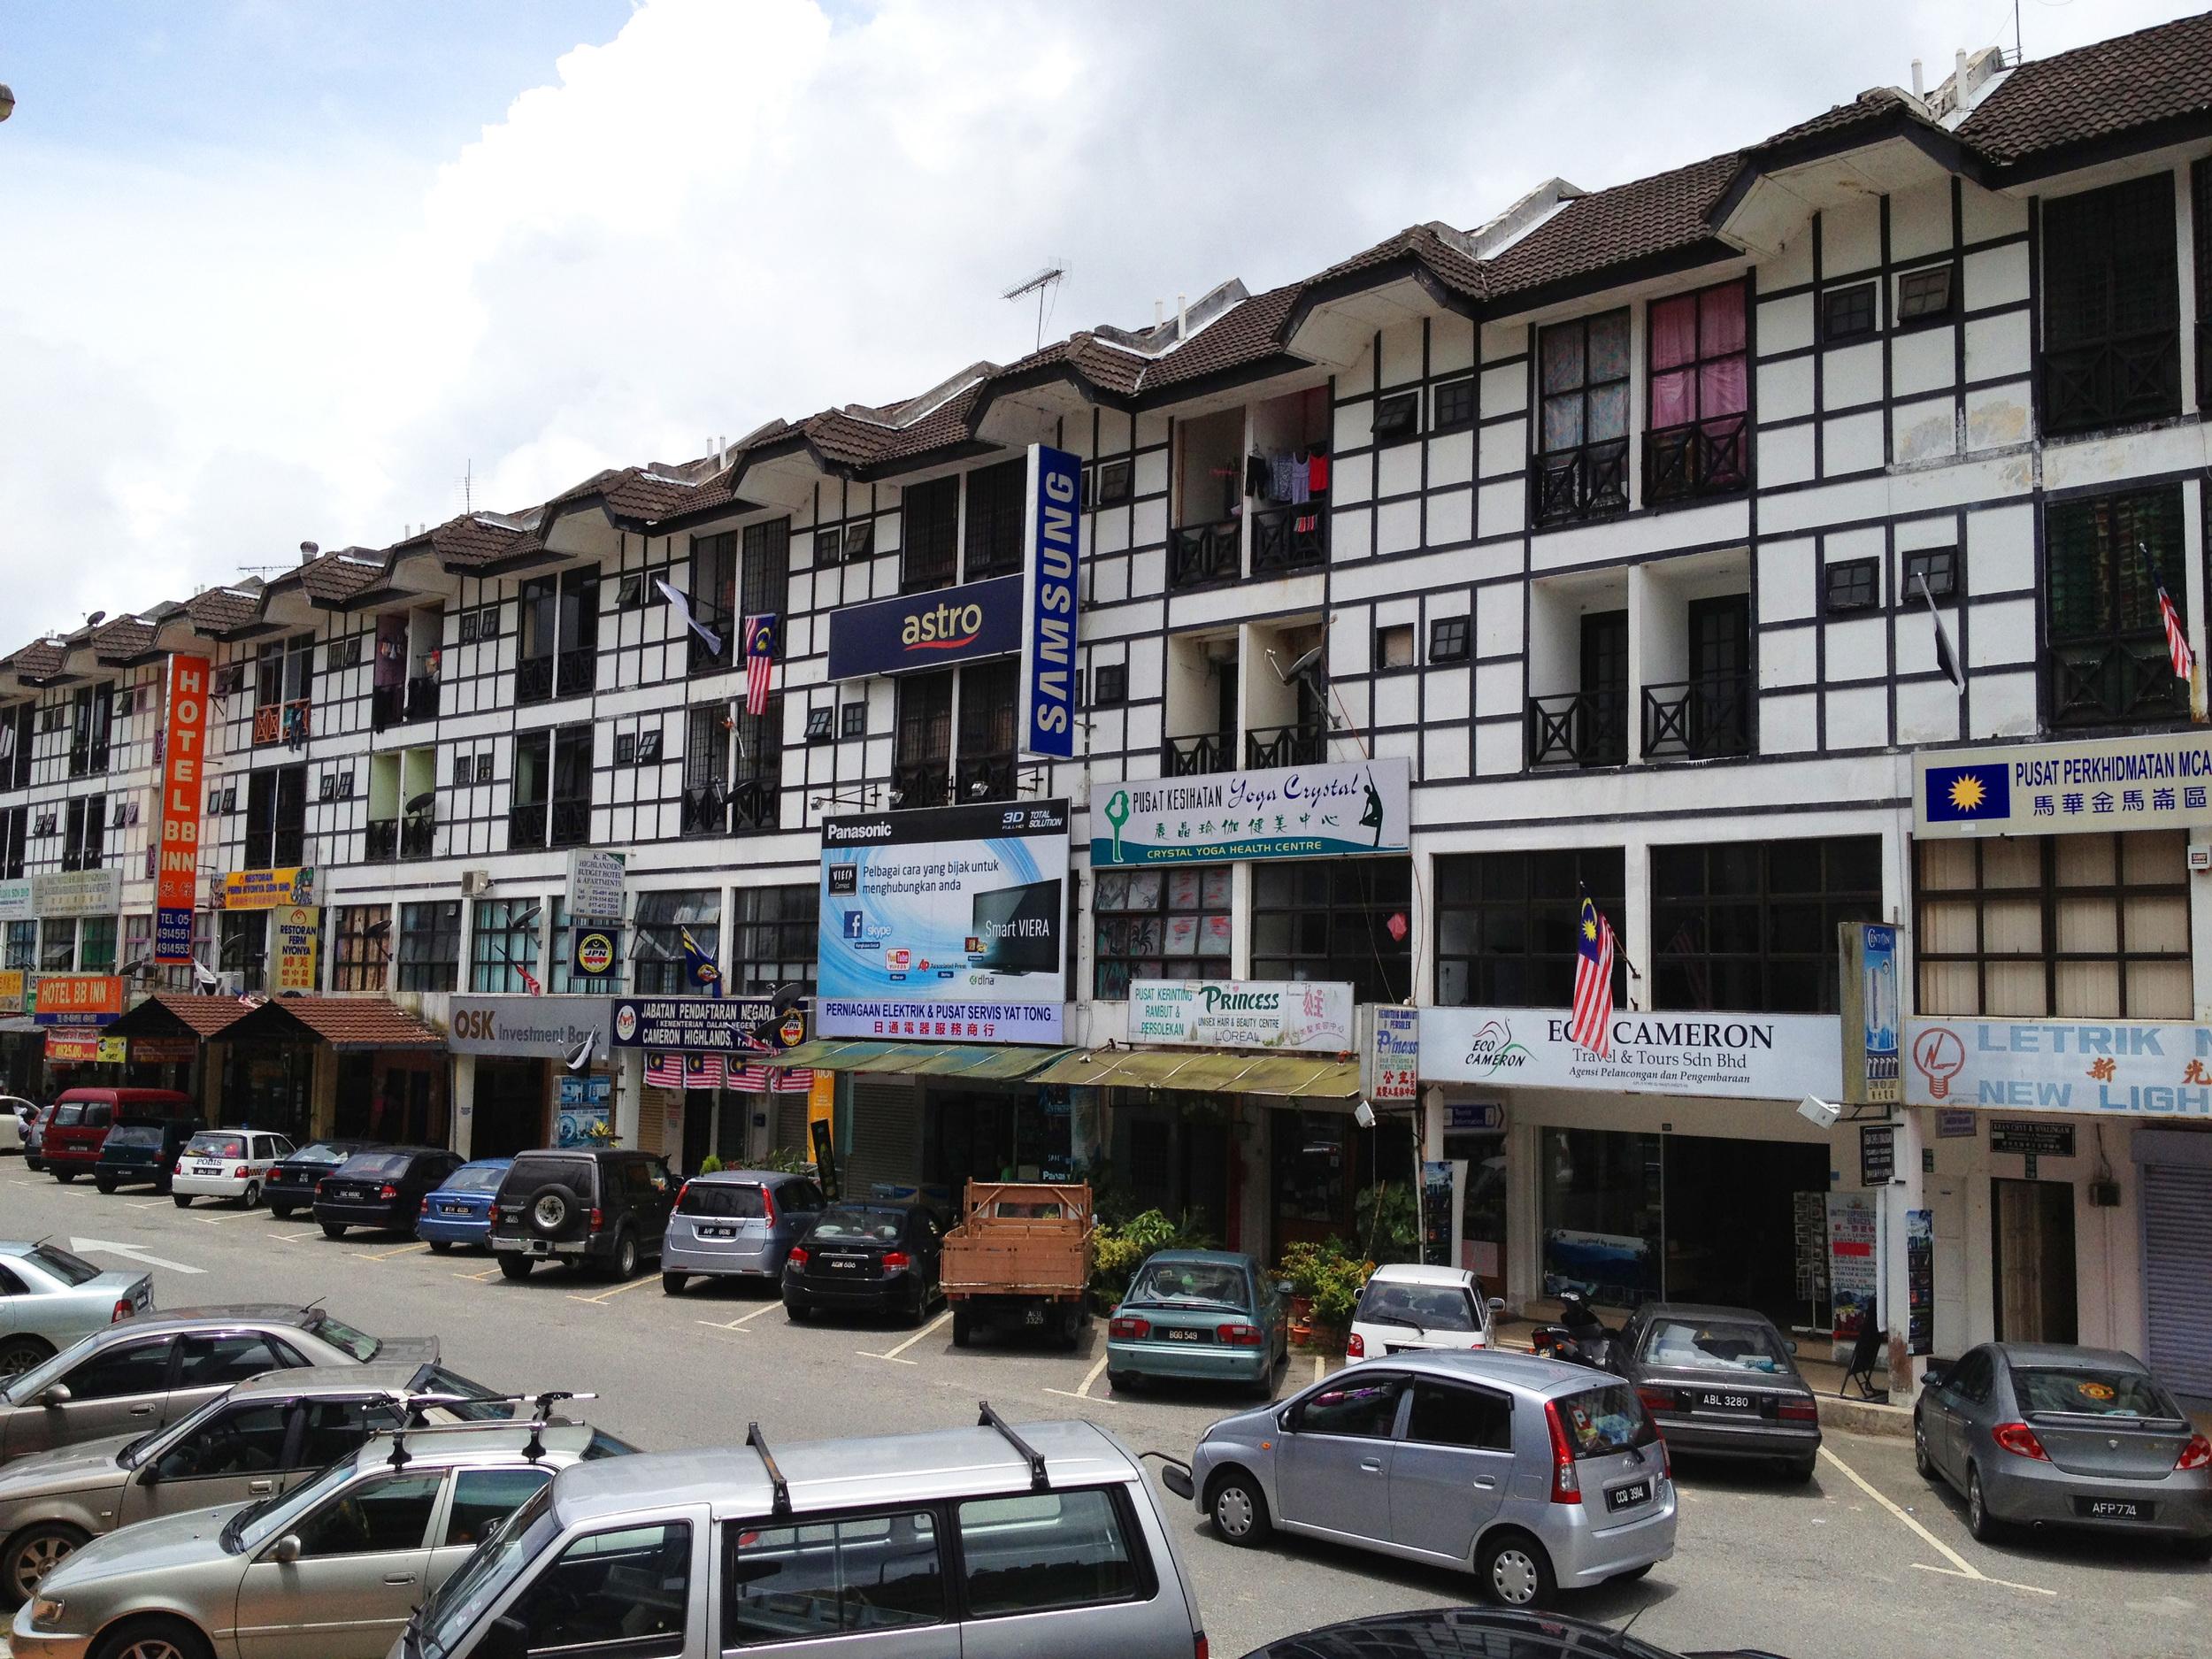 Tanah Rata High Street